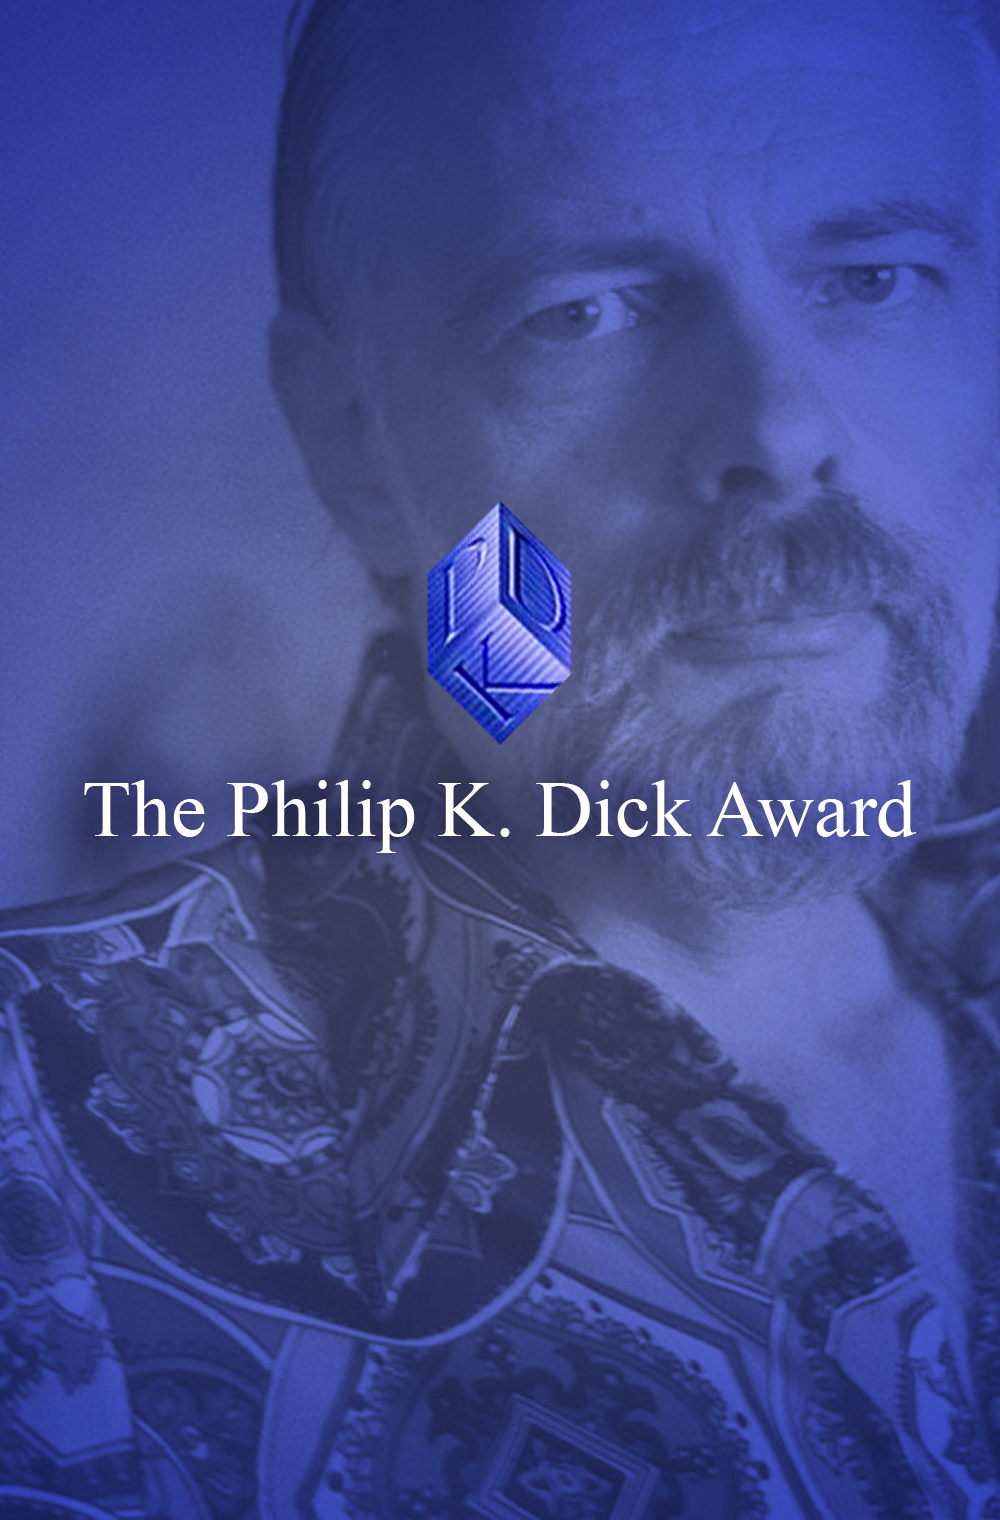 philip k dick award